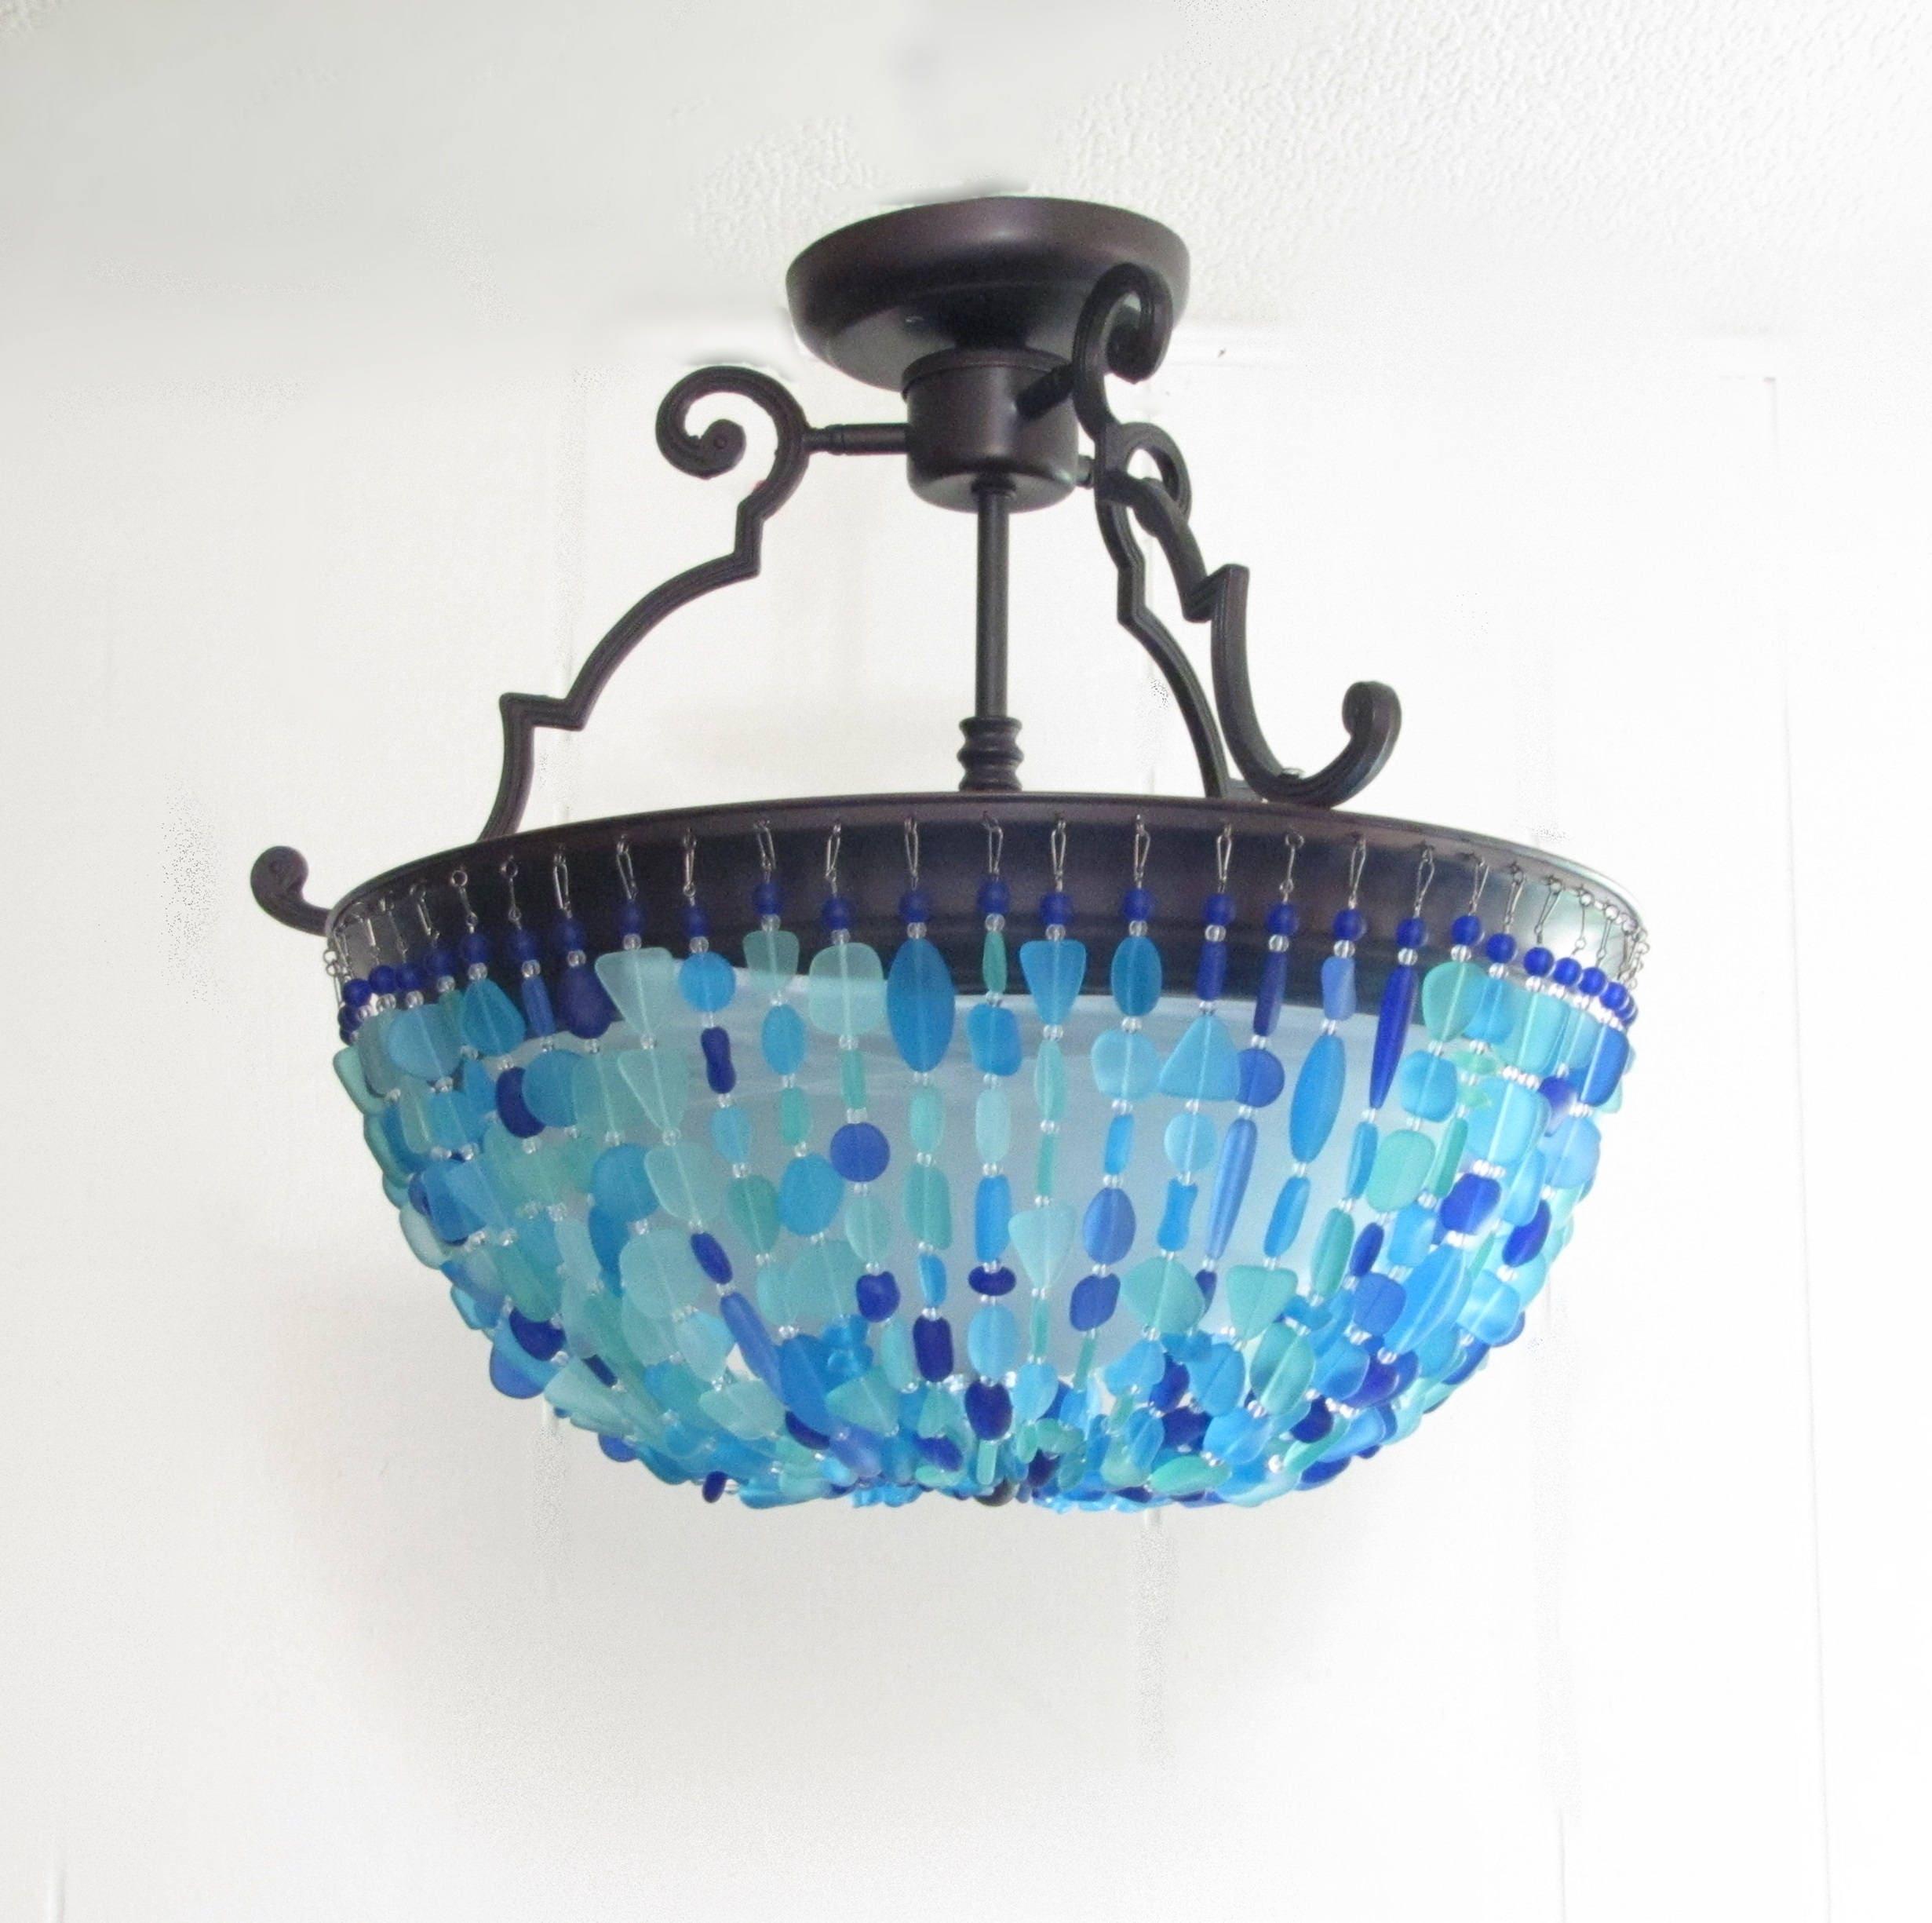 Sea glass chandelier lighting fixture beach glass ceiling zoom arubaitofo Choice Image